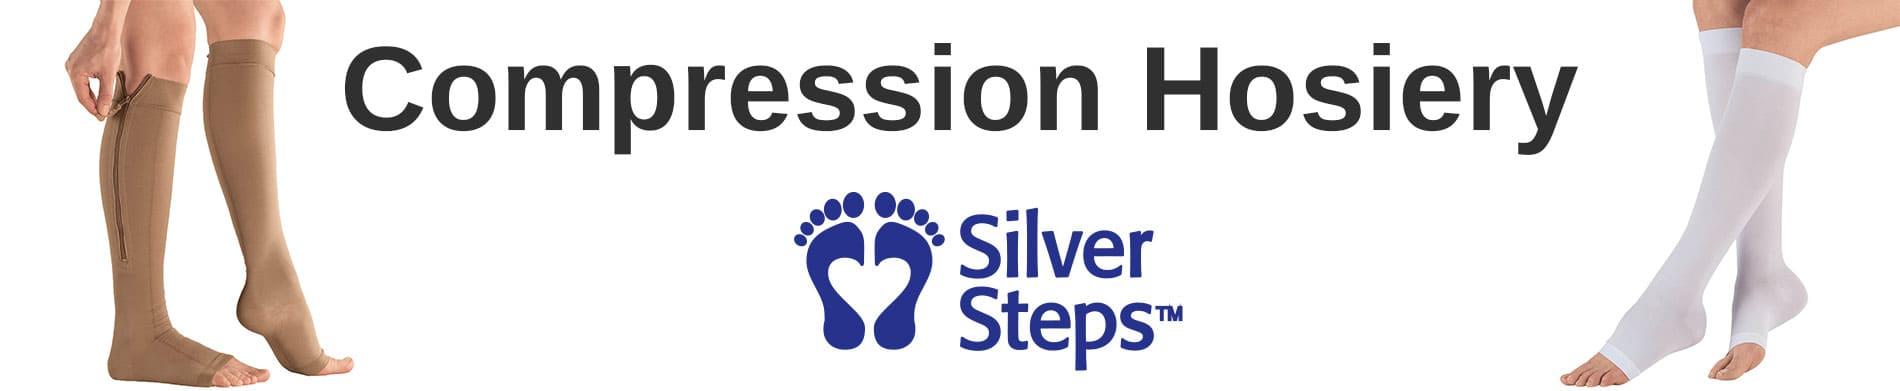 Compression Hosiery by Silver Steps